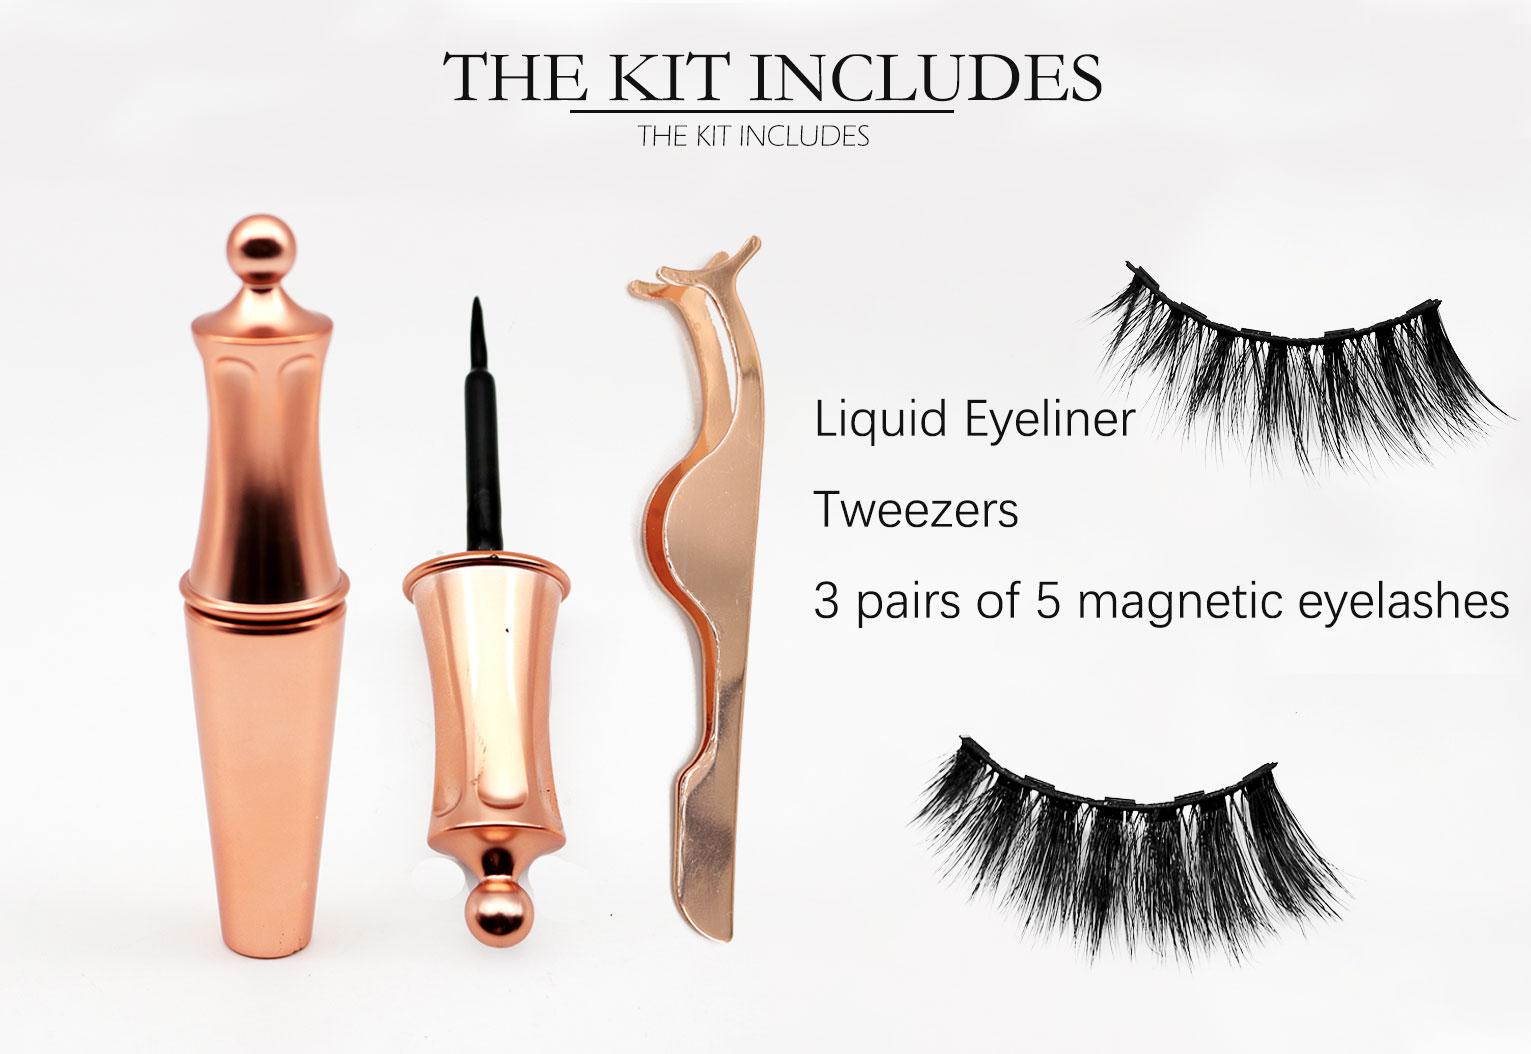 The best, most convenient and comfortable magnet eyelash set